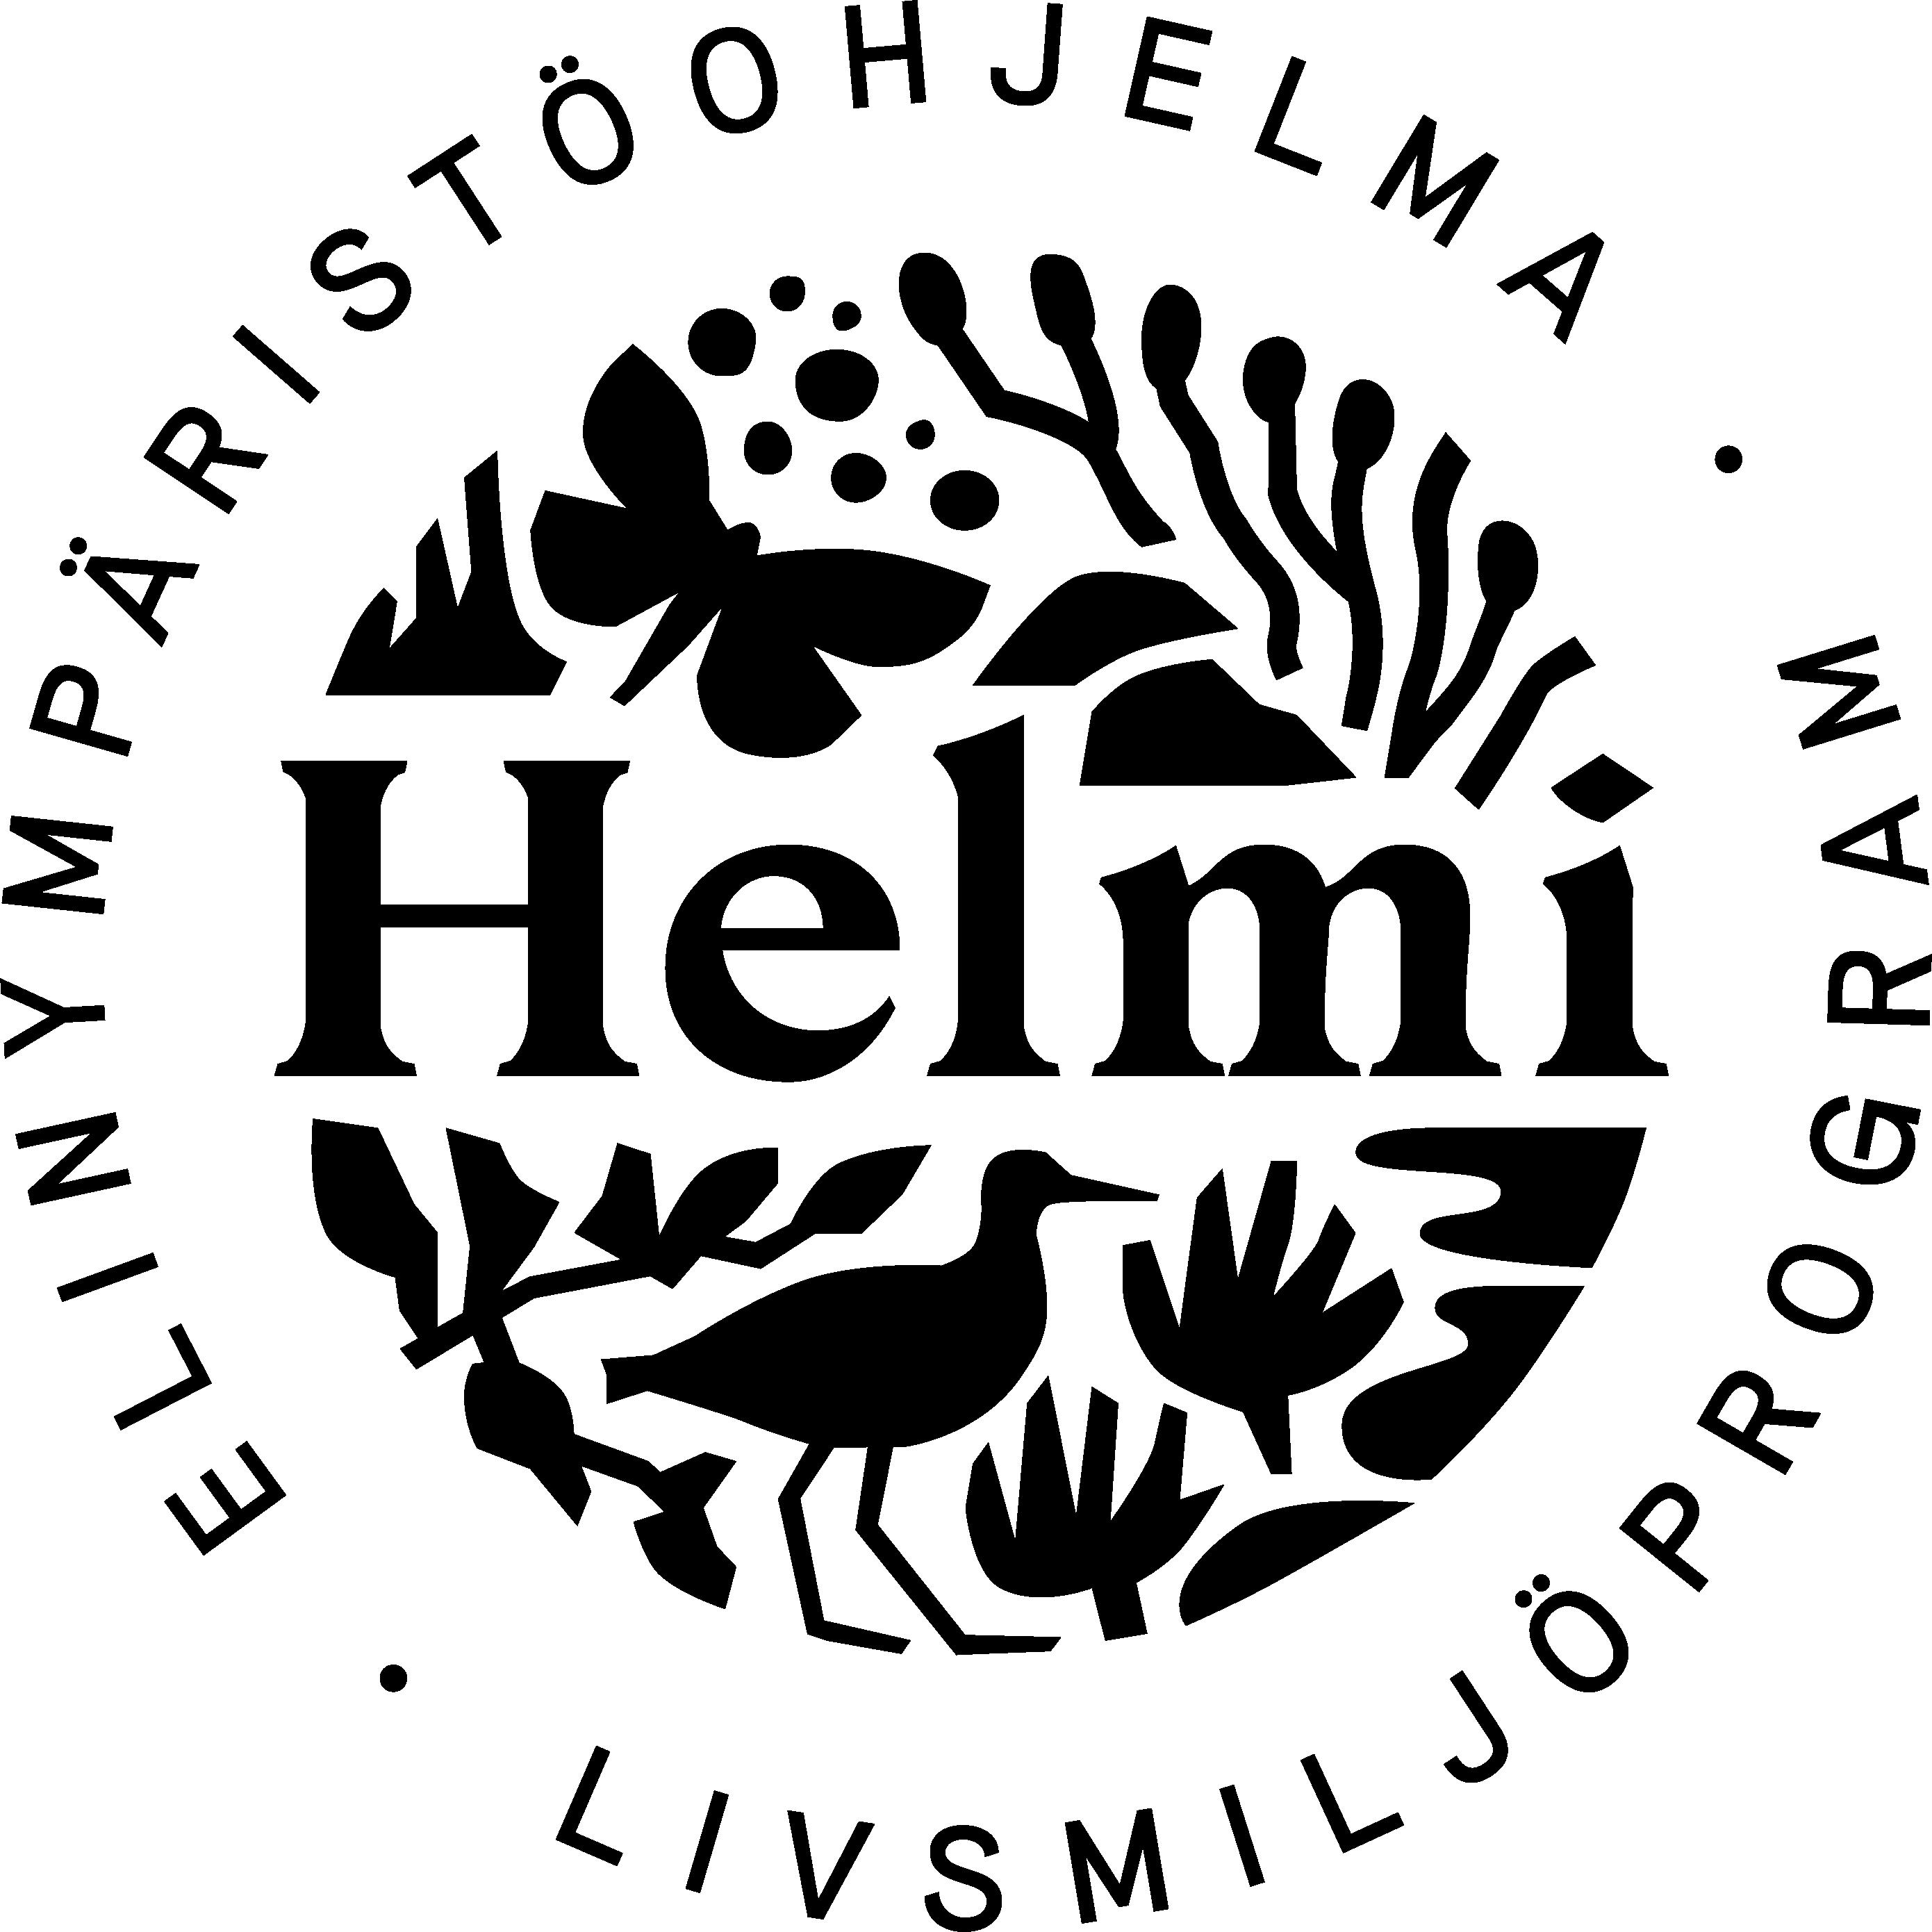 Helmi-ohjelman logo